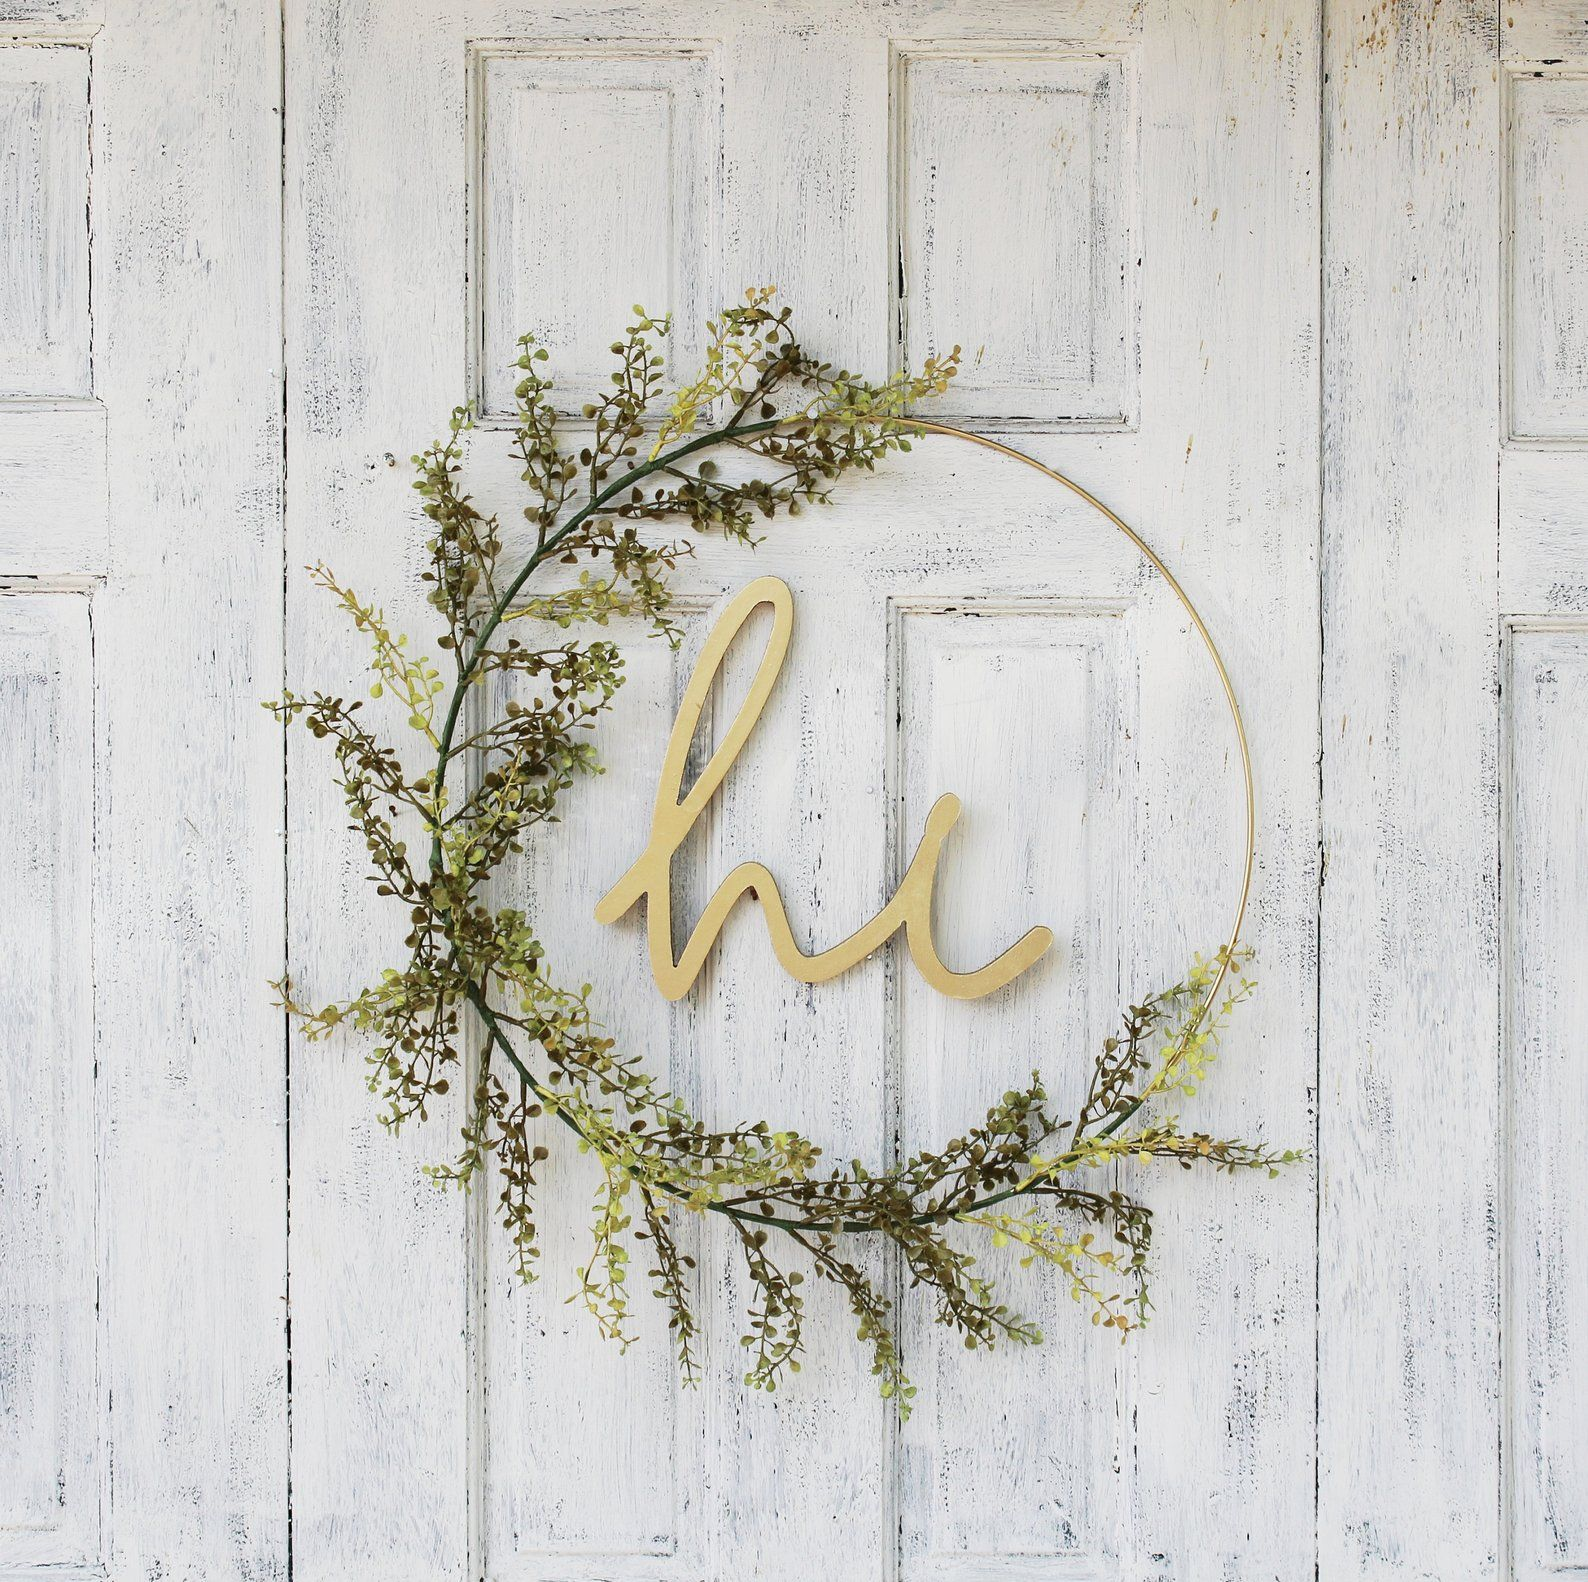 Photo of Hoop Wreath,Minimalist, Modern Wreath,Spring Wreath,Front Door Wreath,Wreath With Hi Sign